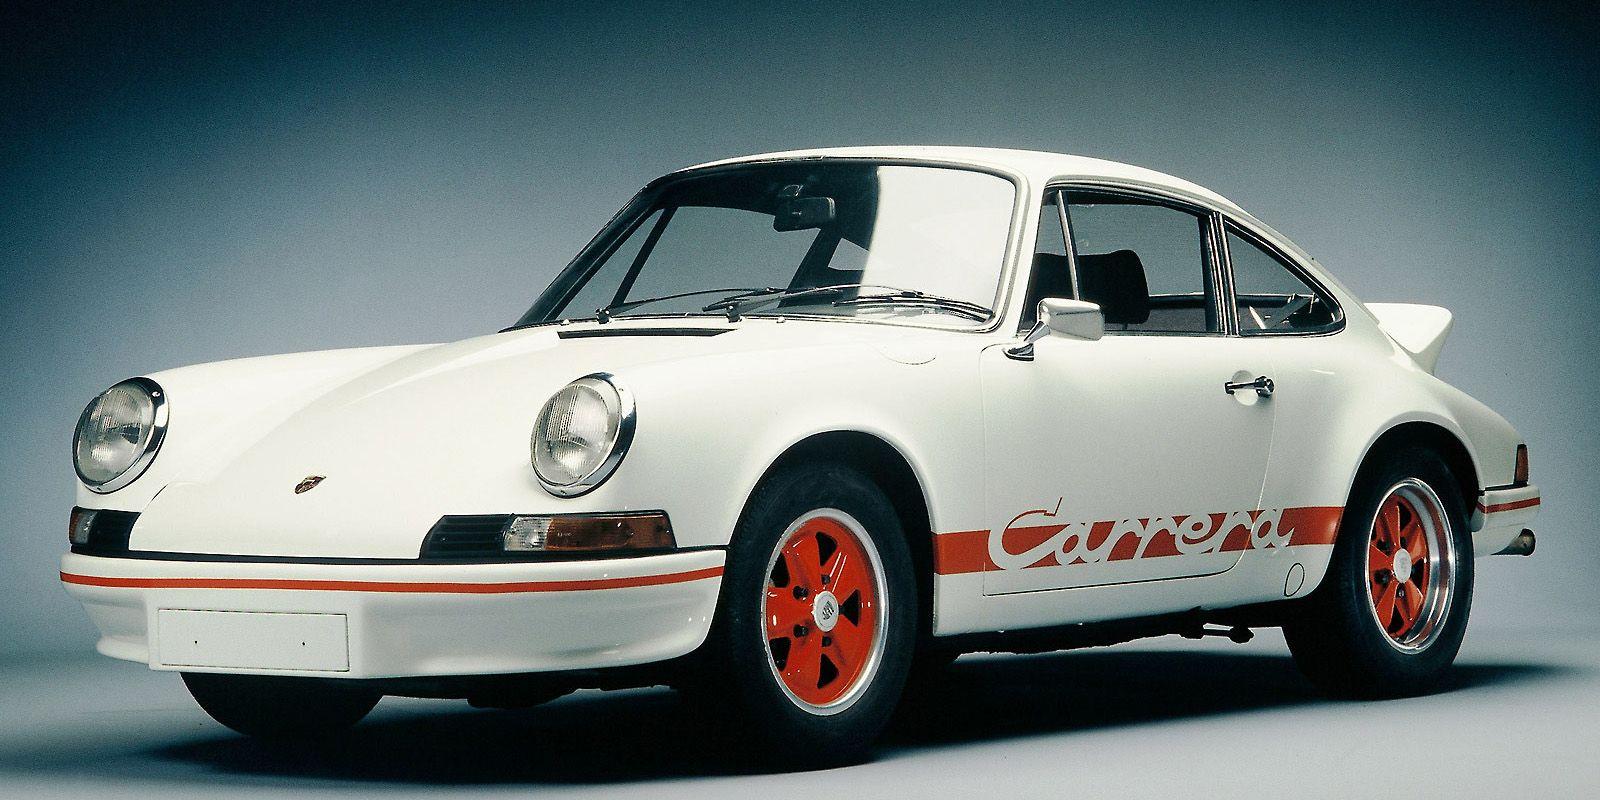 Porsche 911 History - 40+ Facts About the Legendary Porsche 911